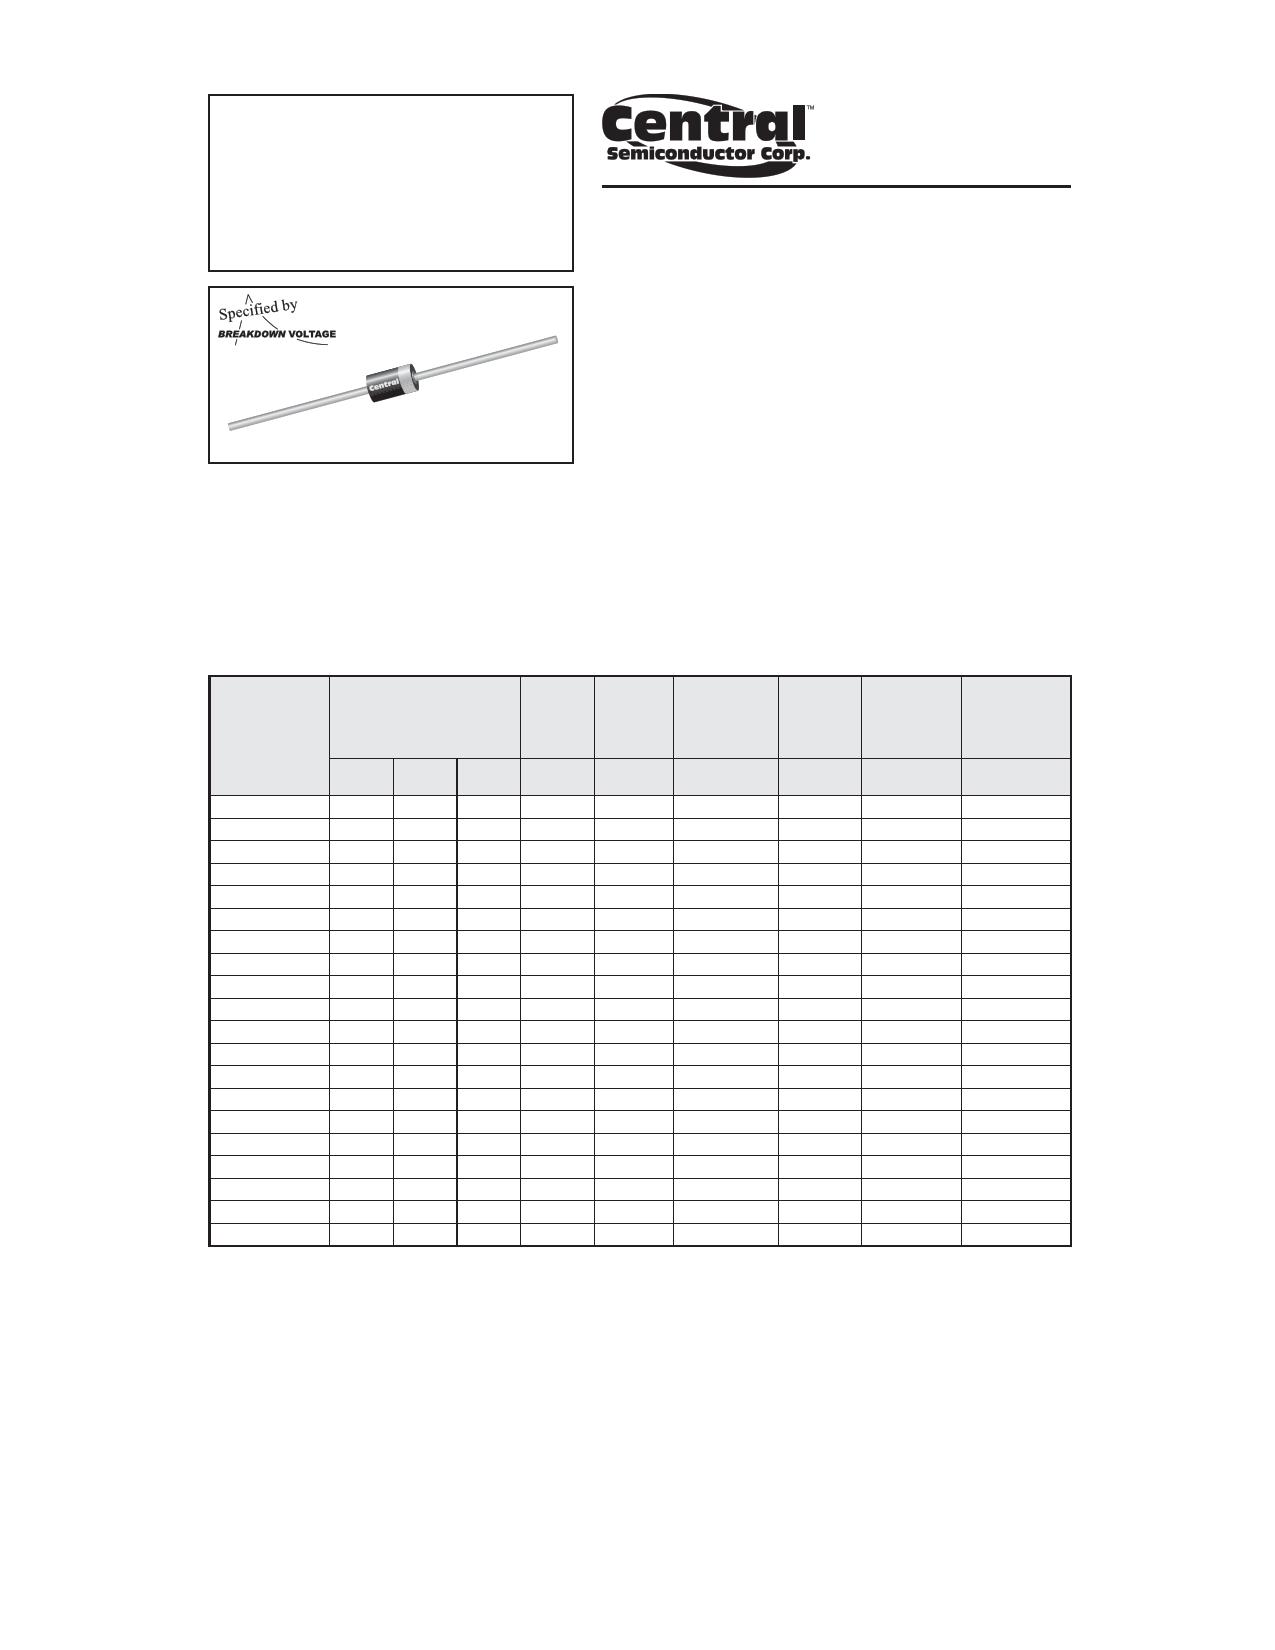 1.5CE51A datasheet